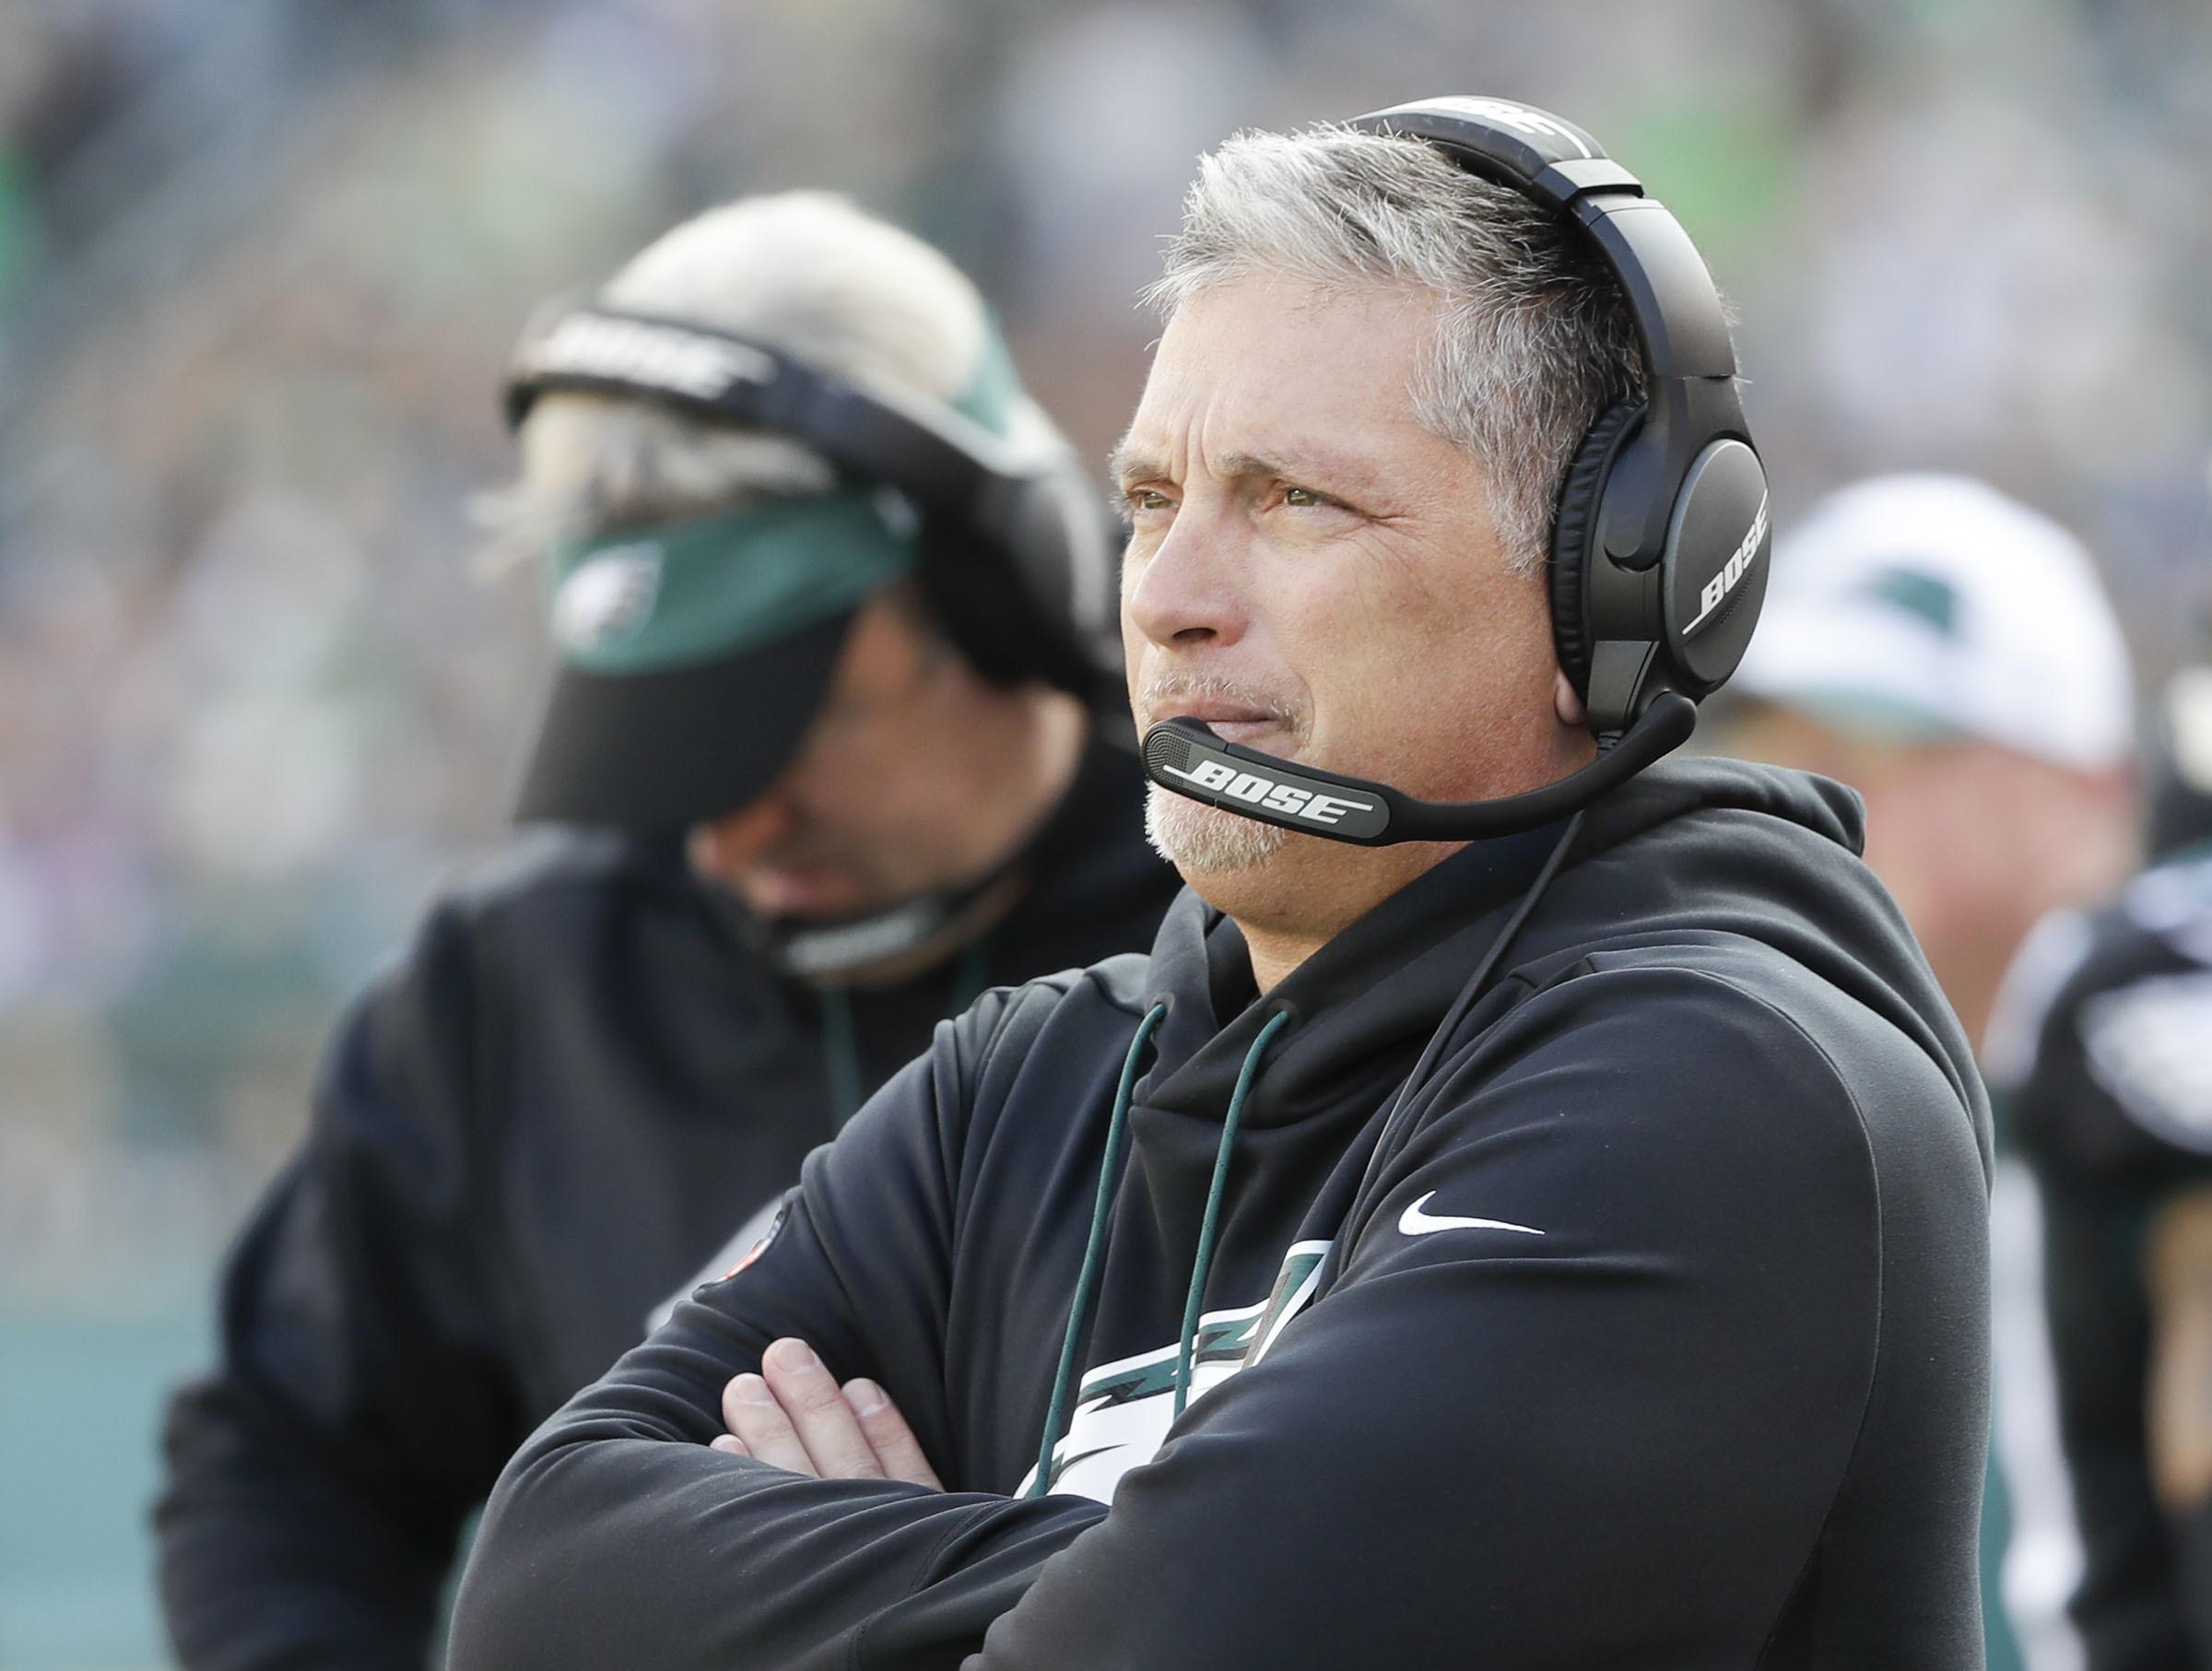 Eagles defensive coordinator Jim Schwartz simplified the game plan in the second half.